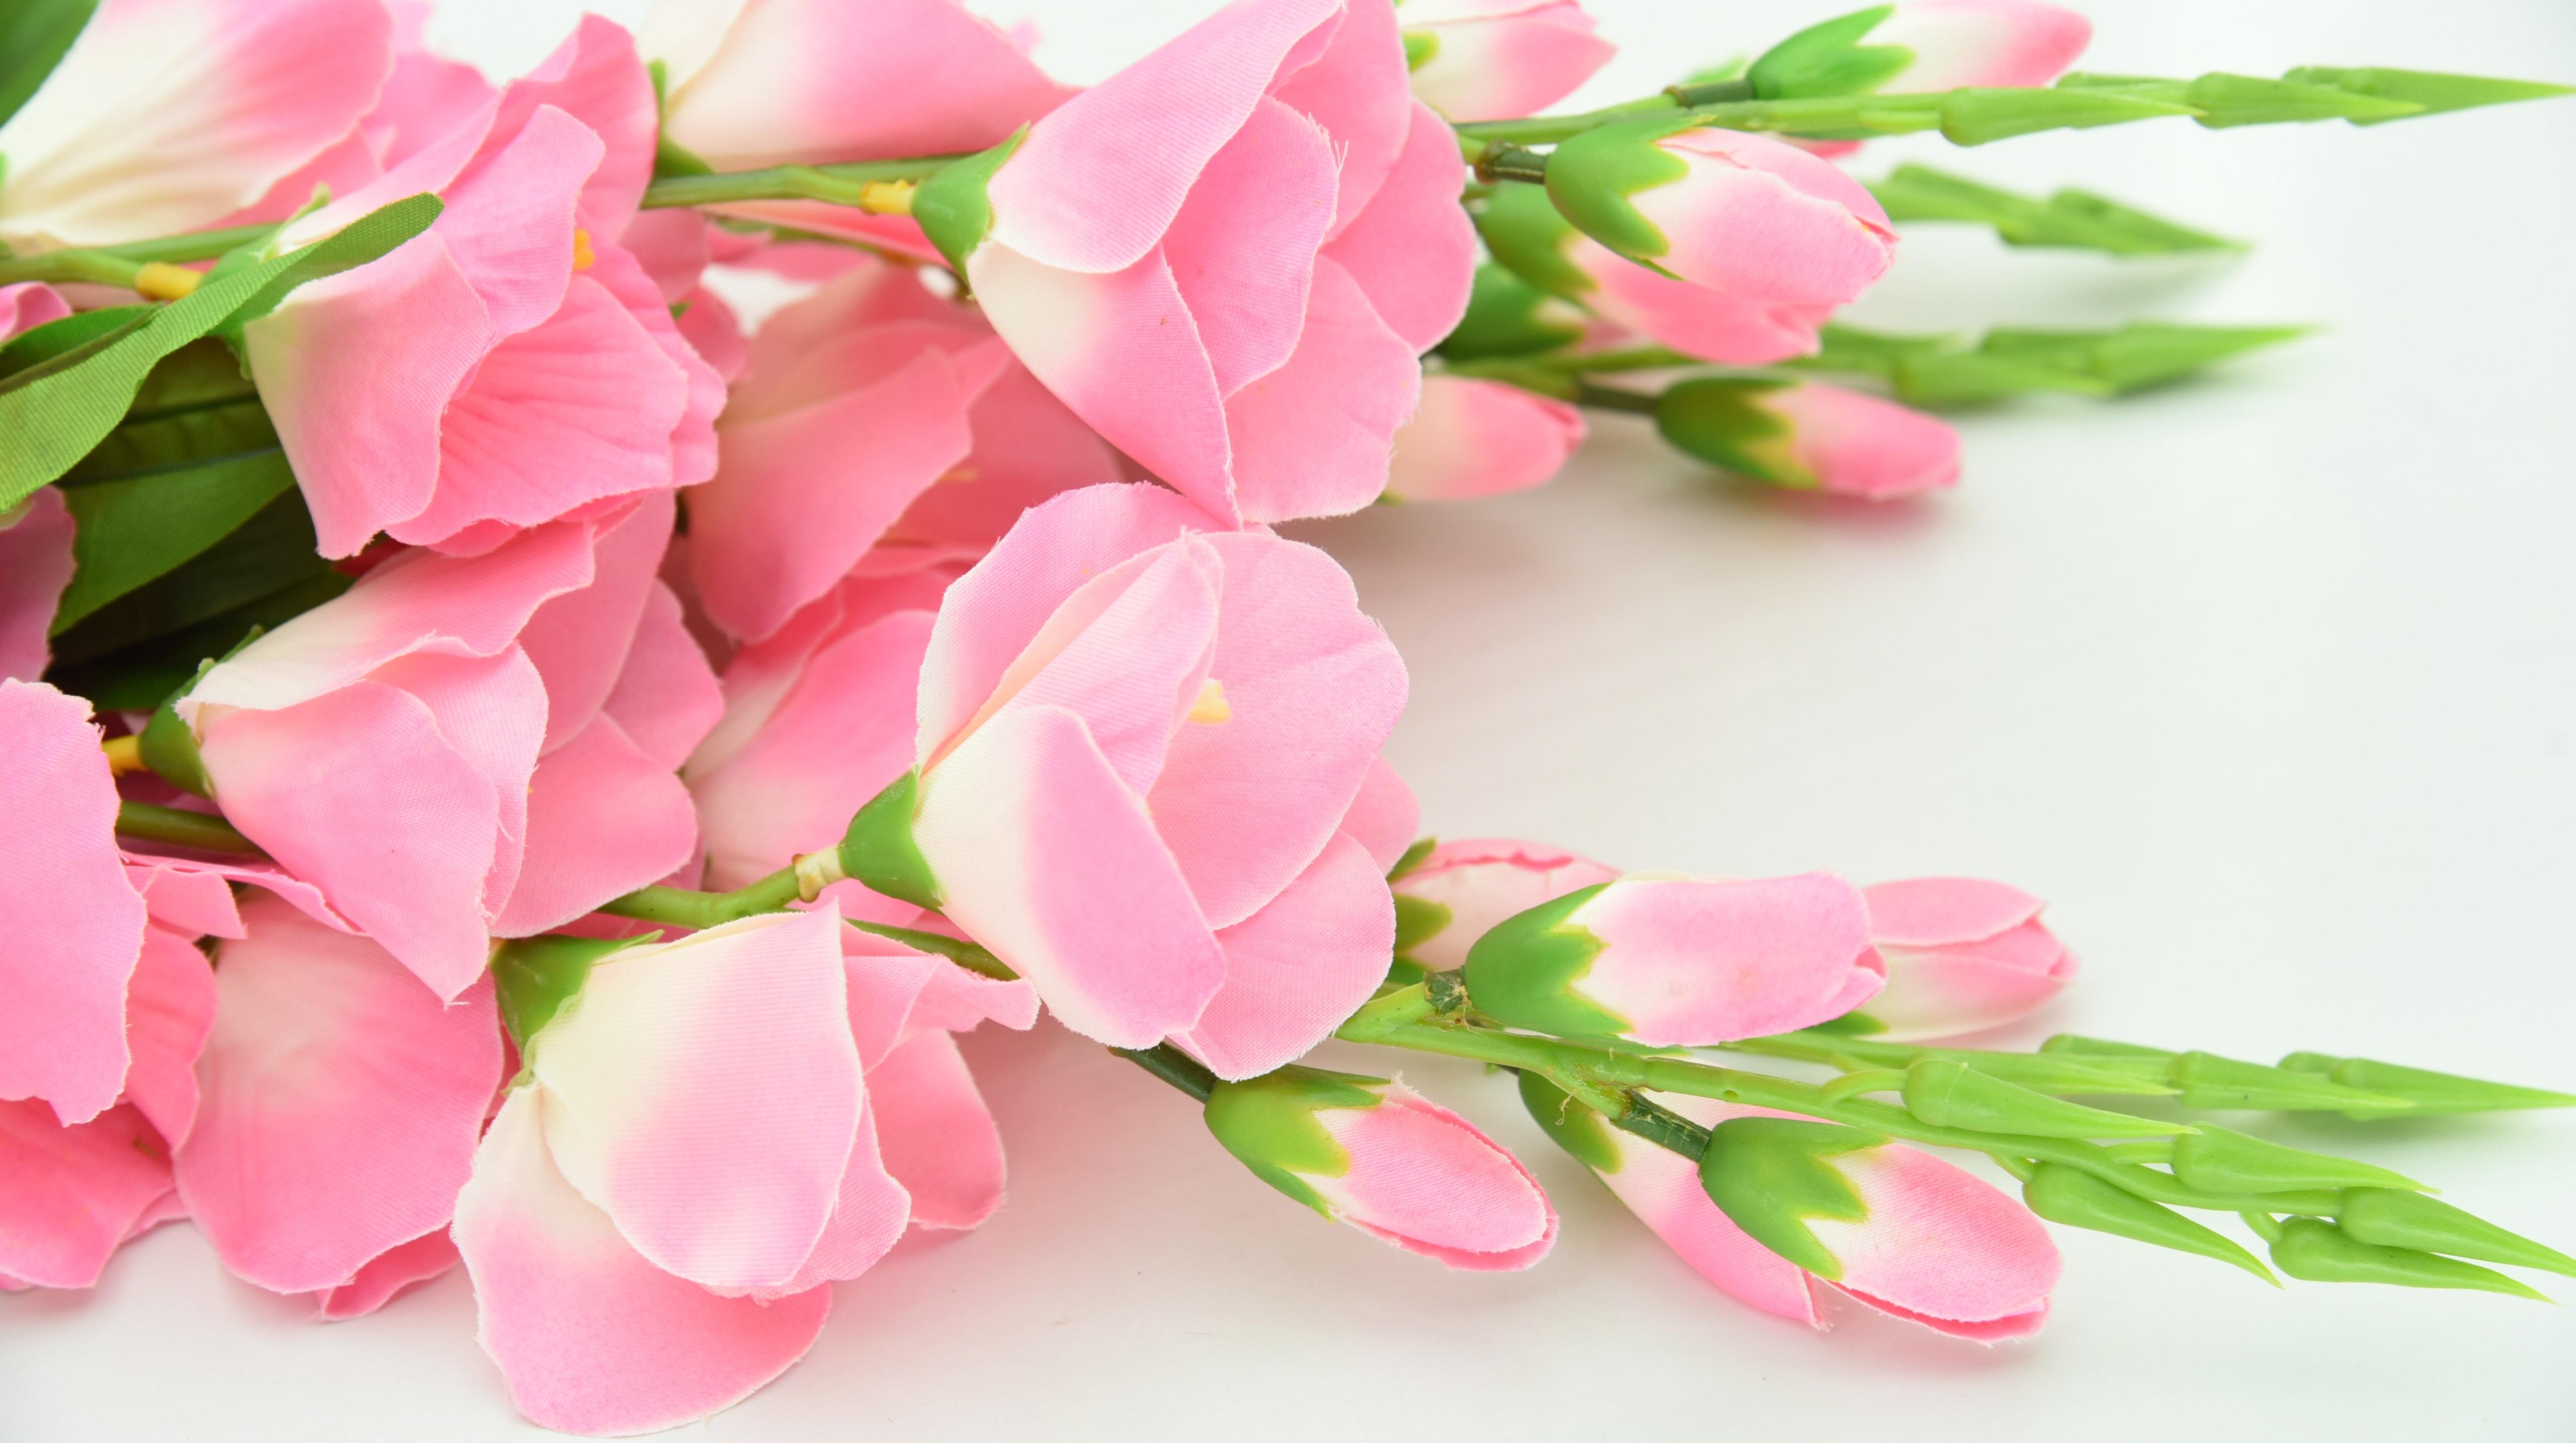 Hdの壁紙 ピンク ピンクの花の無料の写真素材